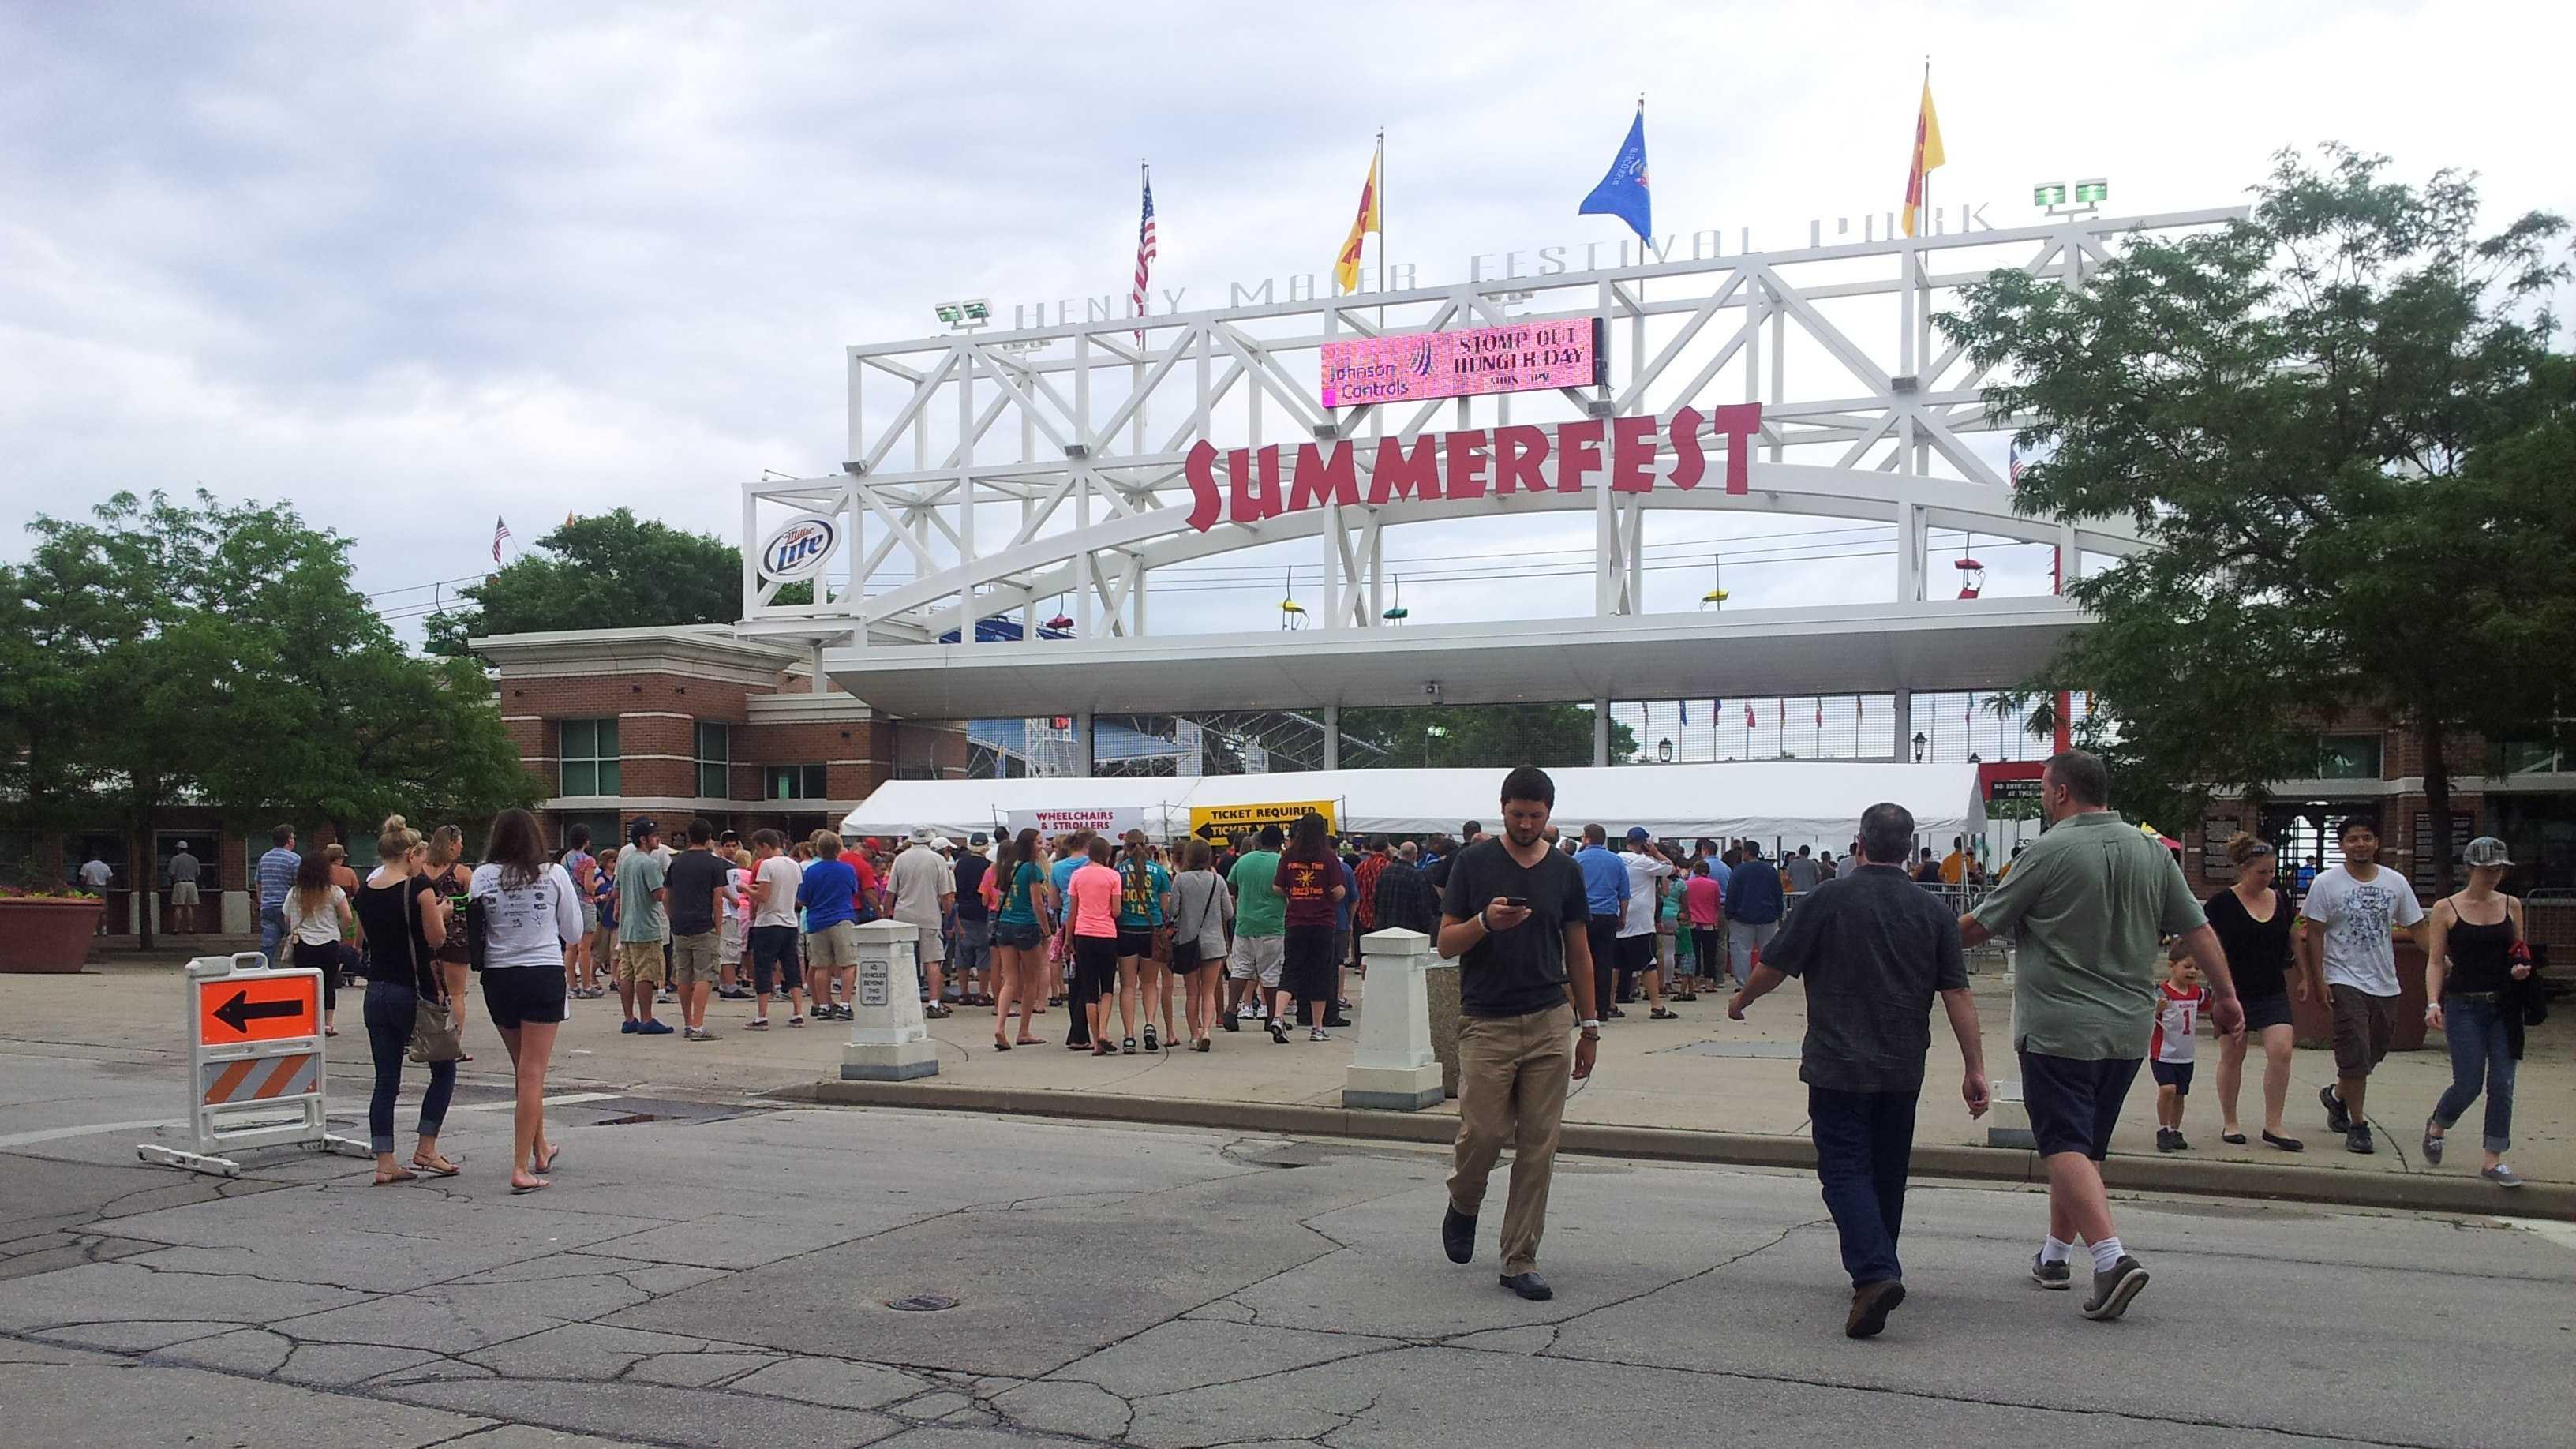 summerfest gates 6-26.jpg